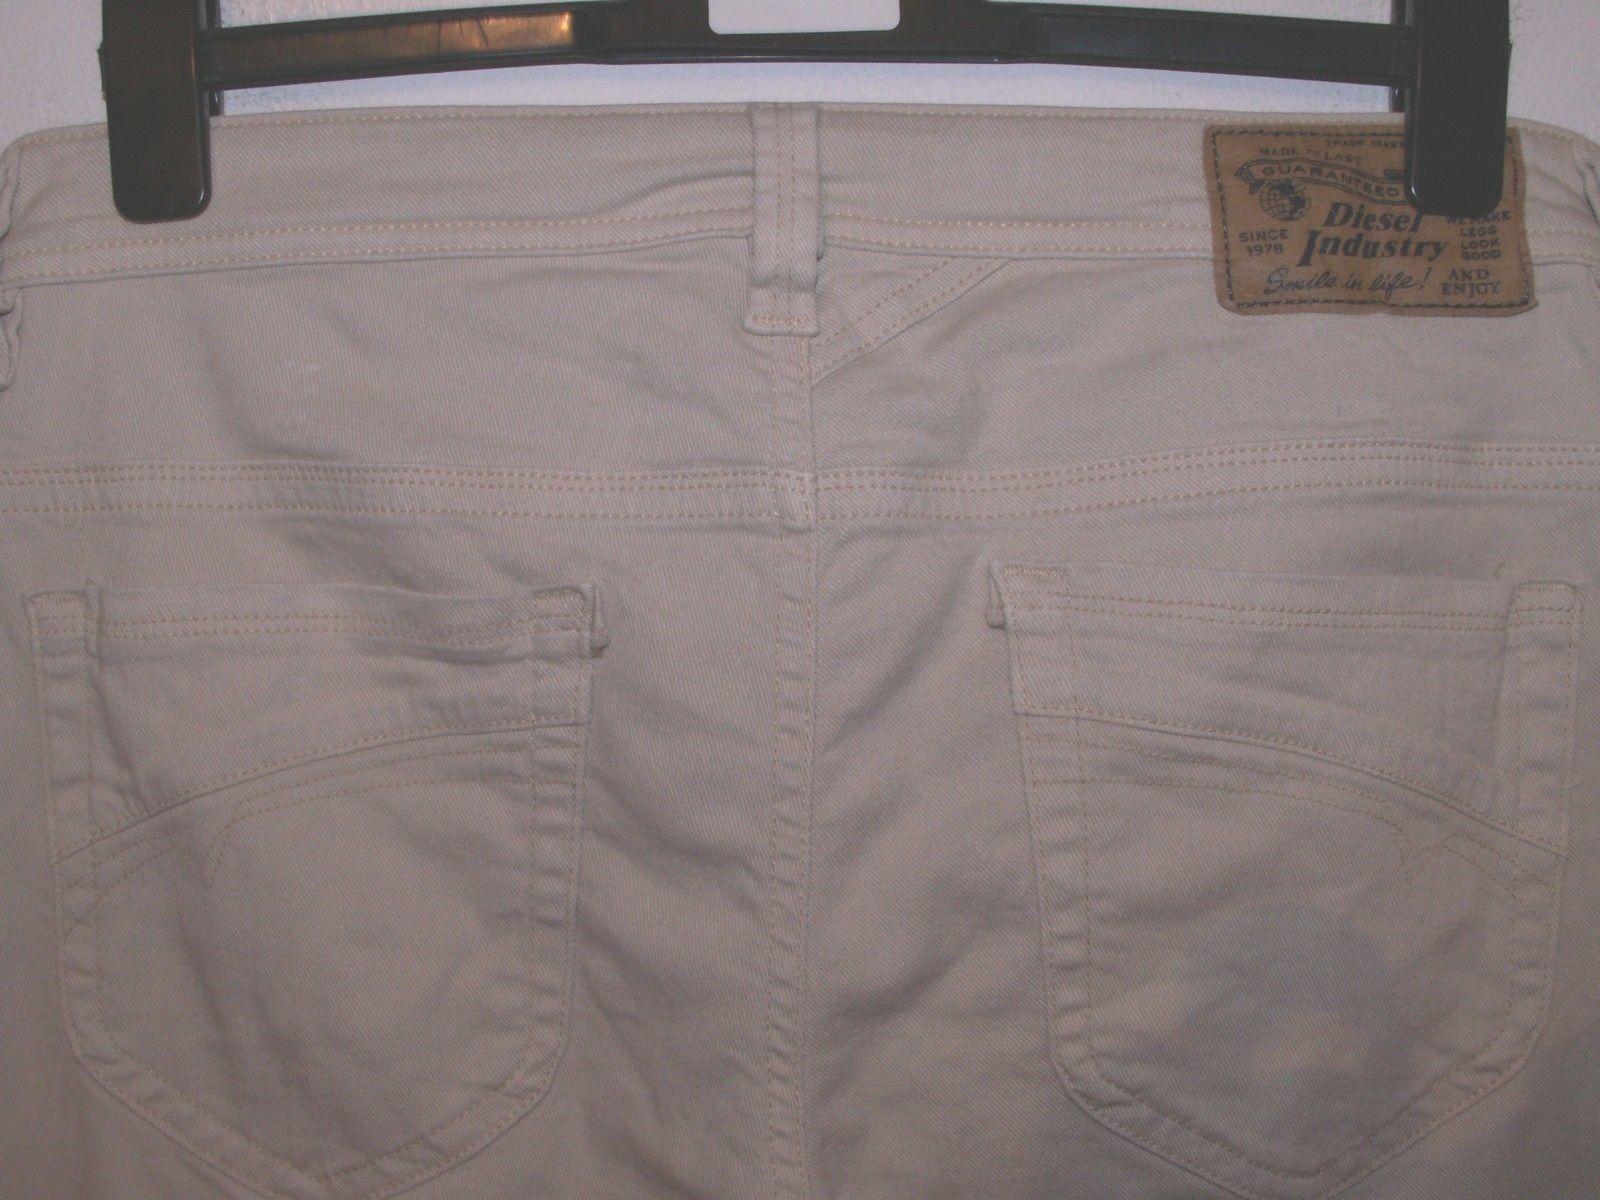 Diesel thanaz slim-skinny fit jeans wash 0RW66 stretch W32 L32 (a3355)